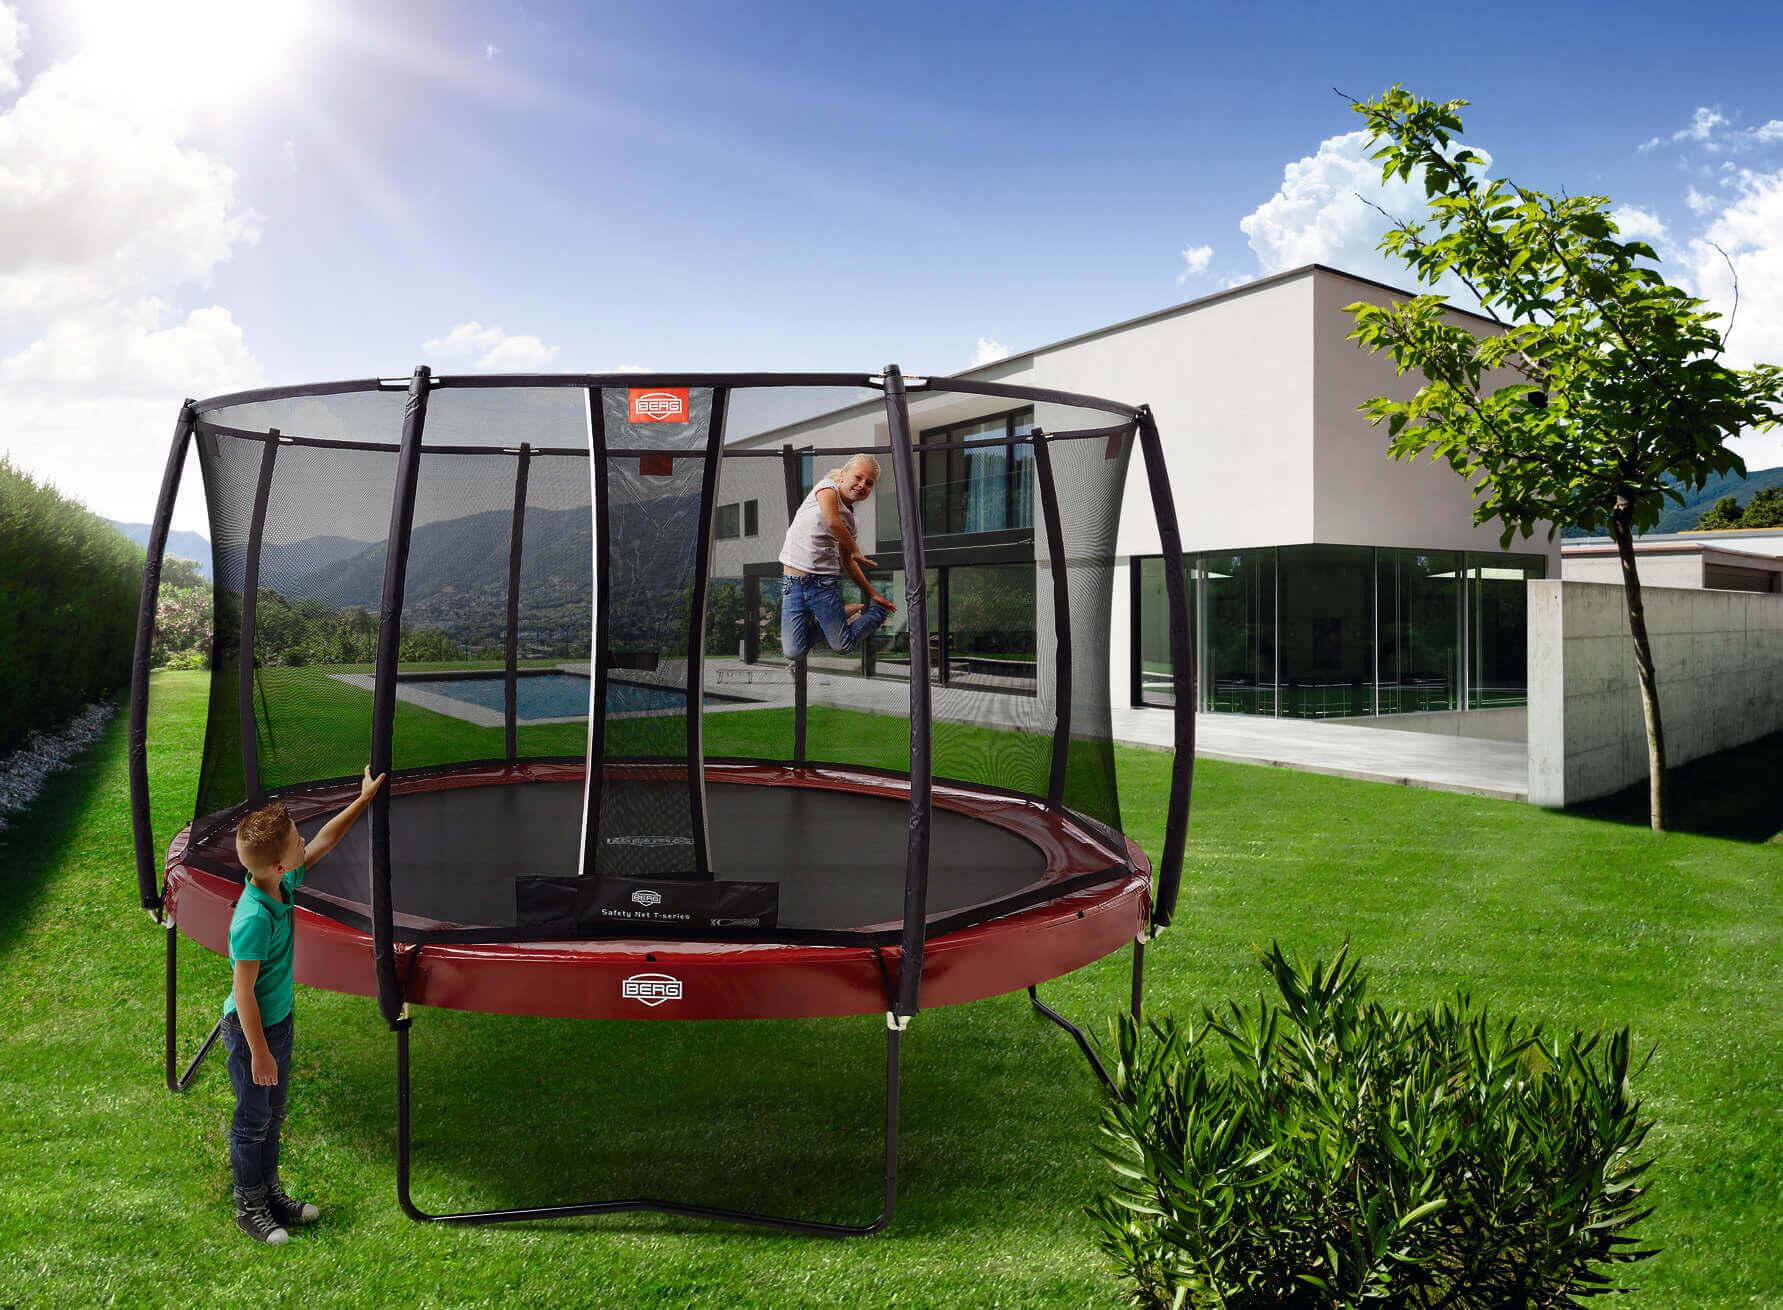 trampolinformen in oval rechteckig klassisch in rund. Black Bedroom Furniture Sets. Home Design Ideas